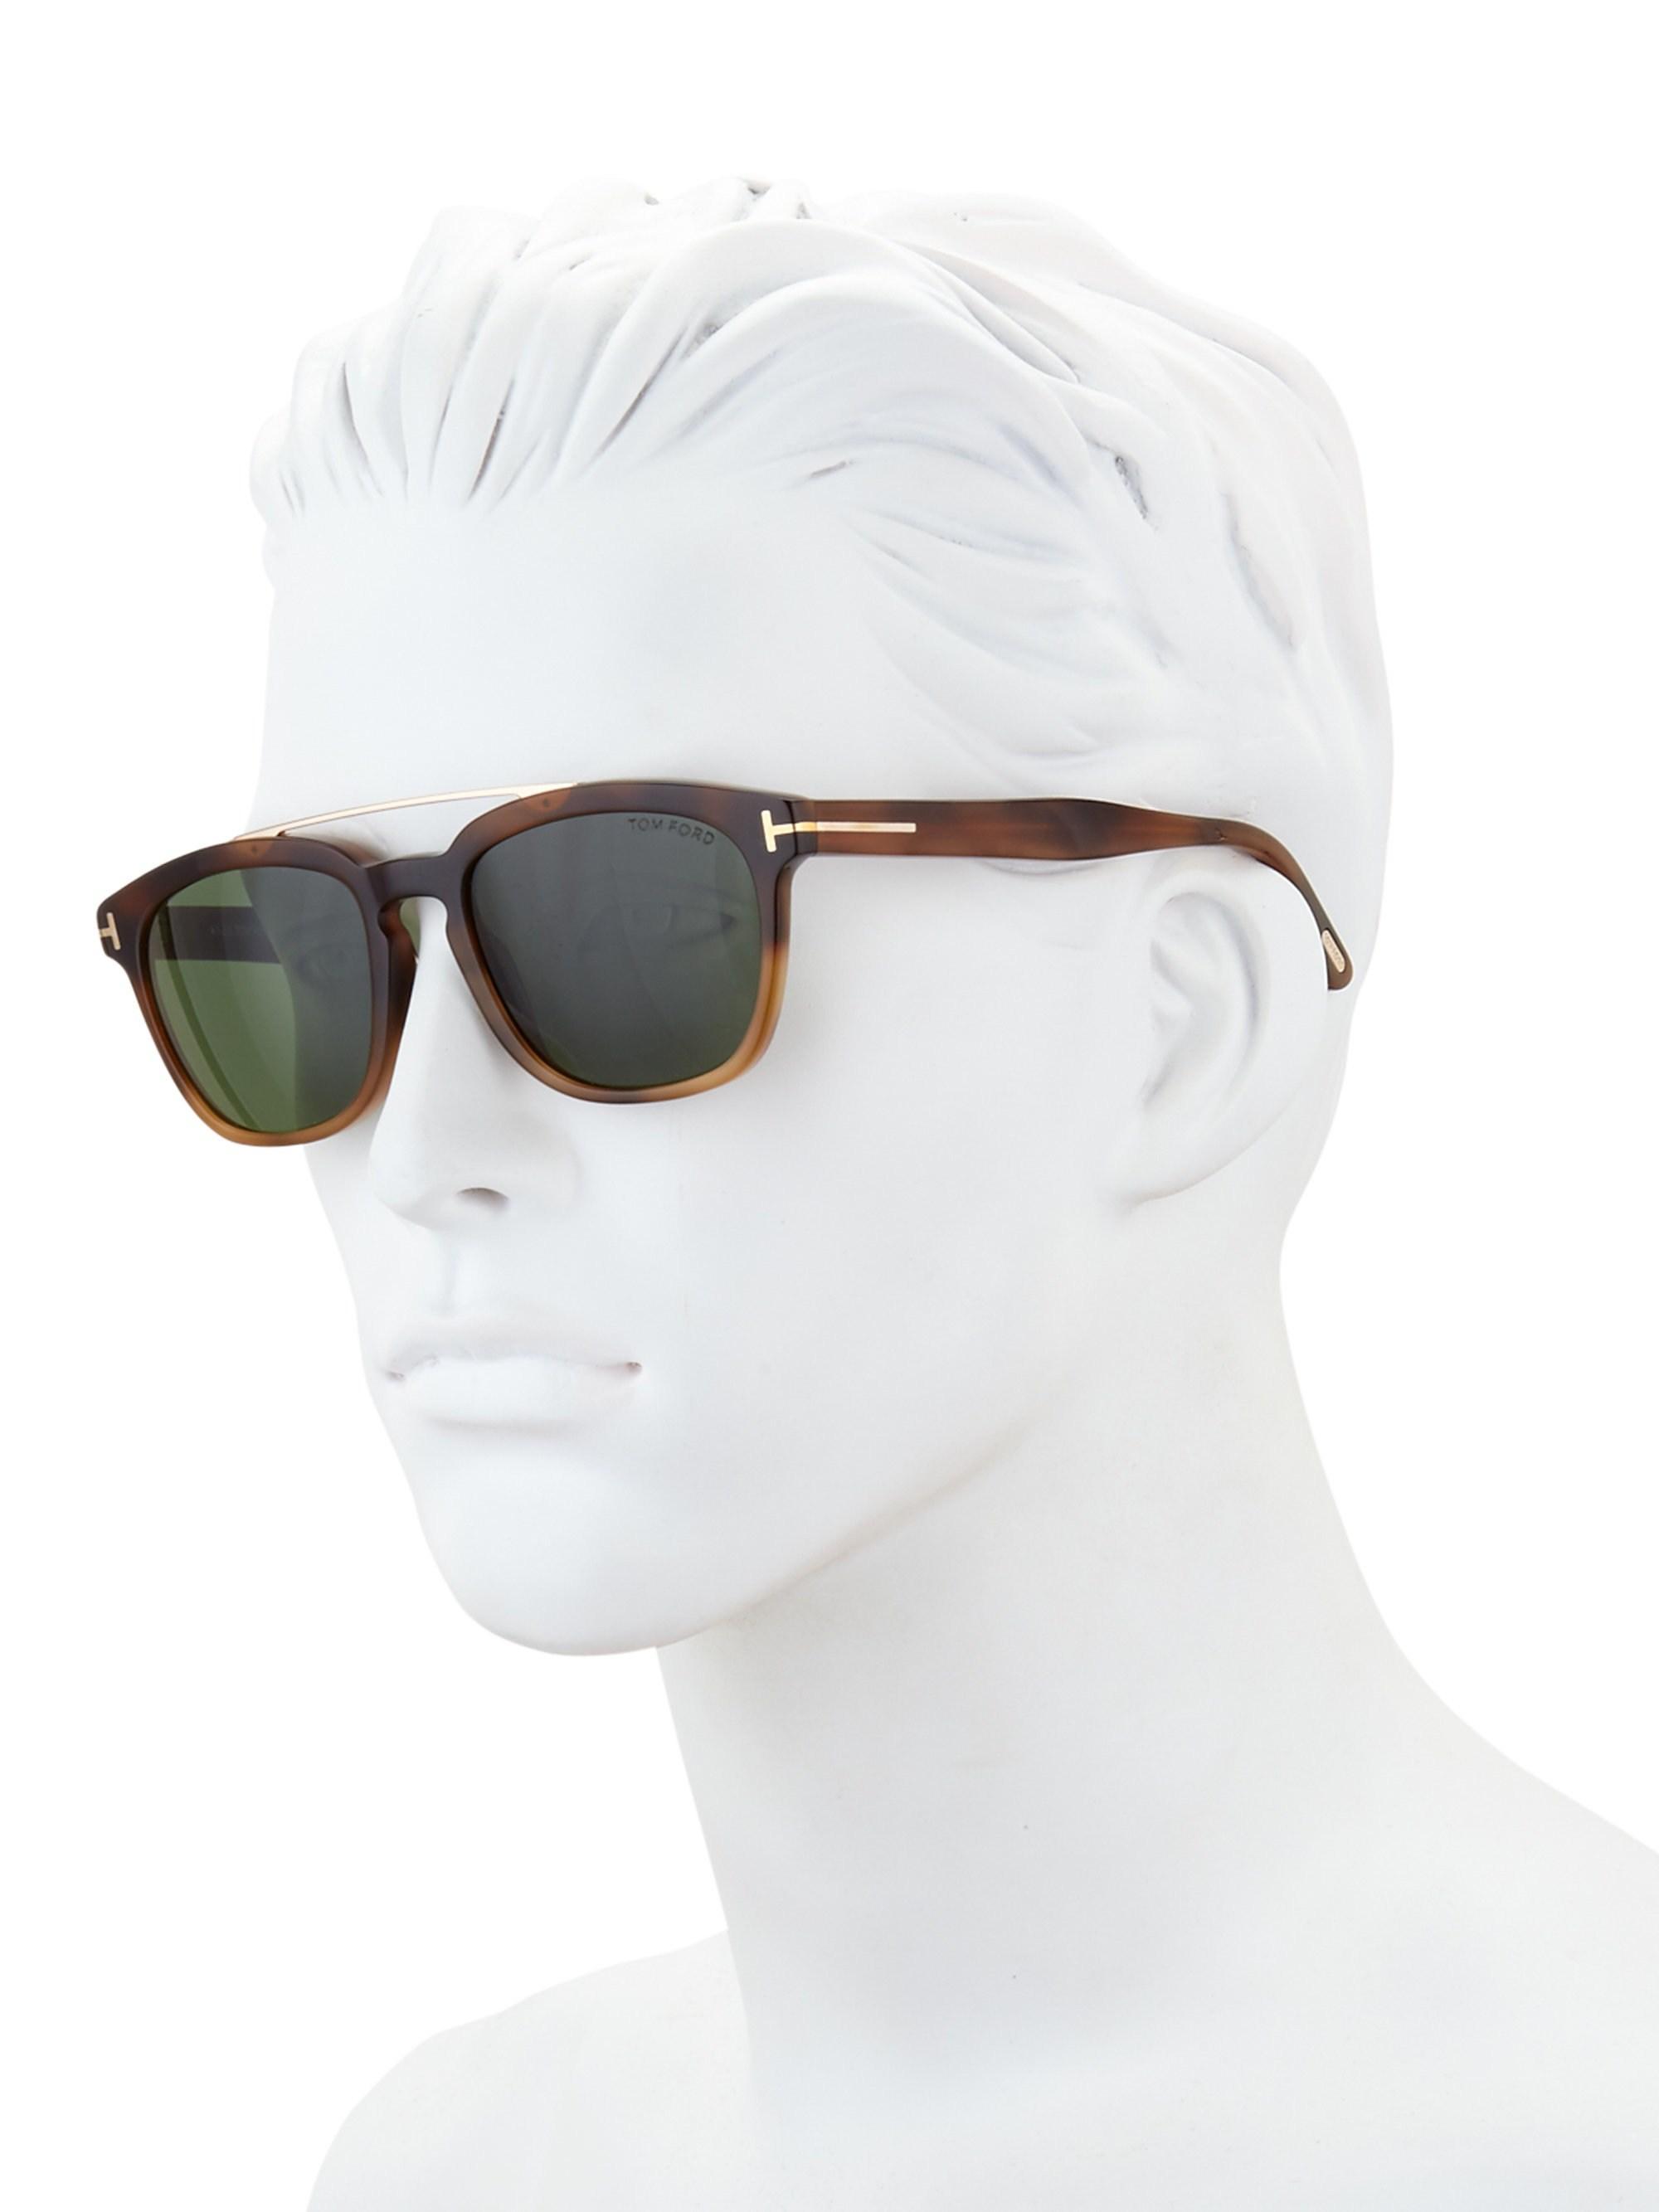 9682858f08 Lyst - Tom Ford Holt 54mm Square Sunglasses for Men